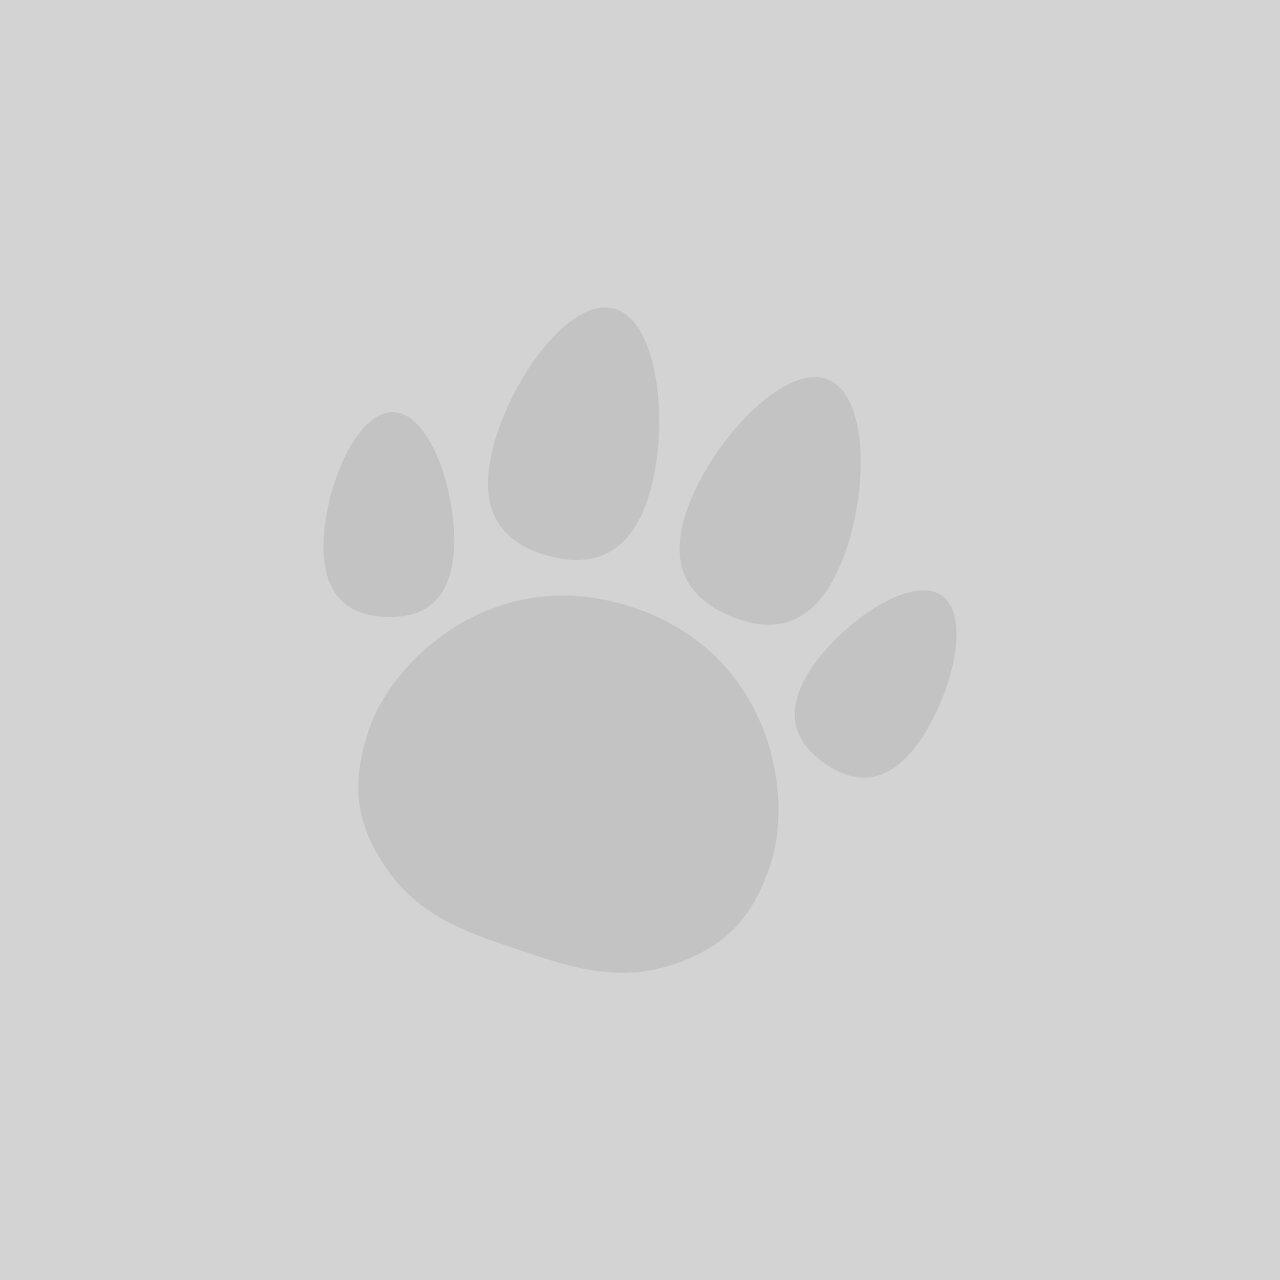 Beaphar Canicomfort Calming Diffuser Refill 48ml